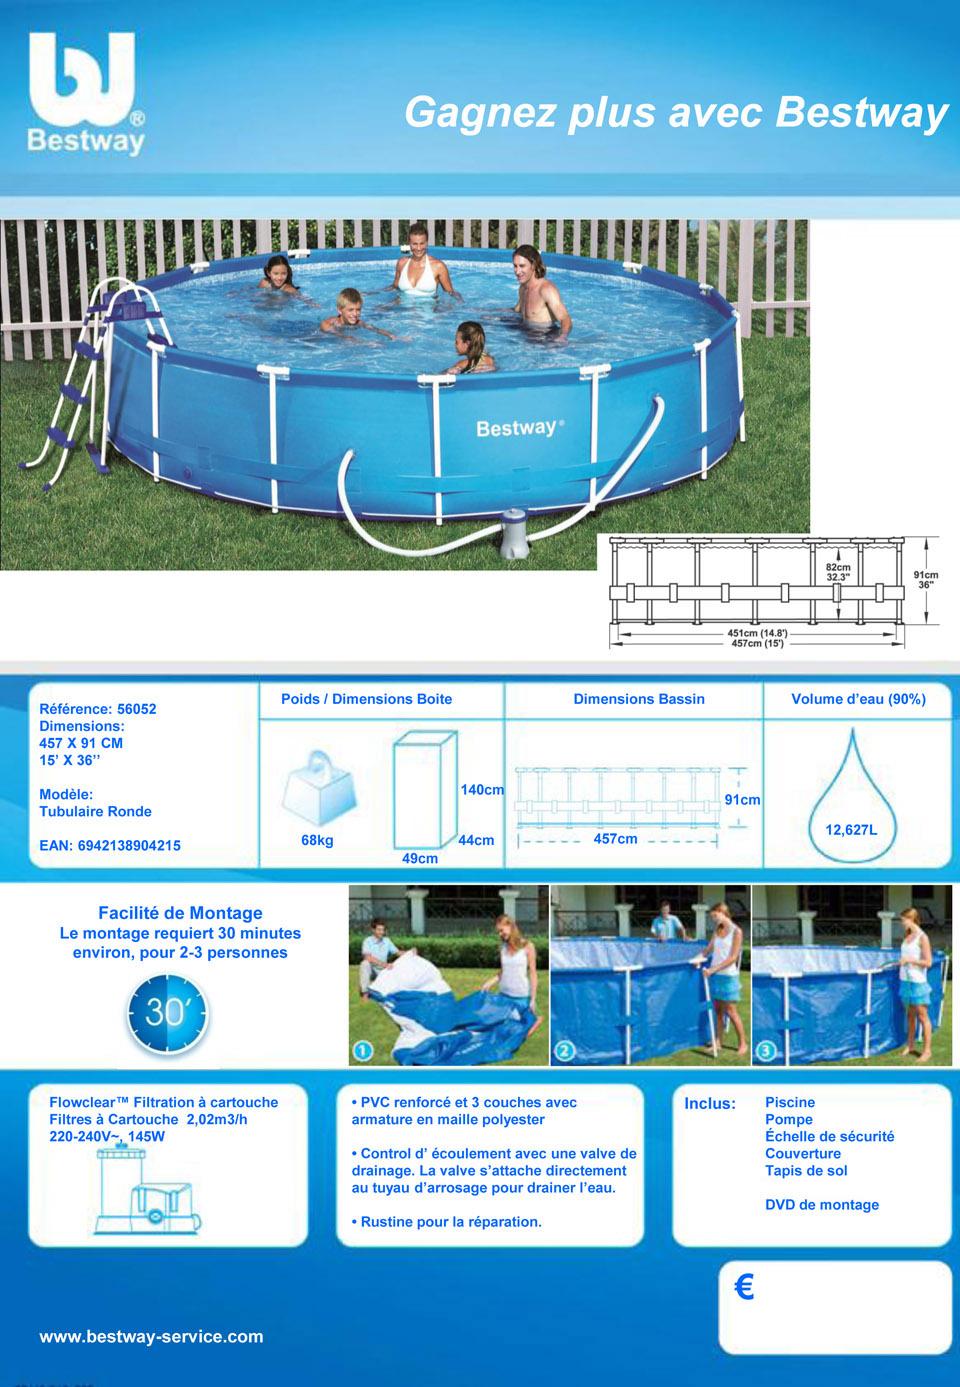 Fiche piscine autoportante 2.44 x 0.66m Bestway